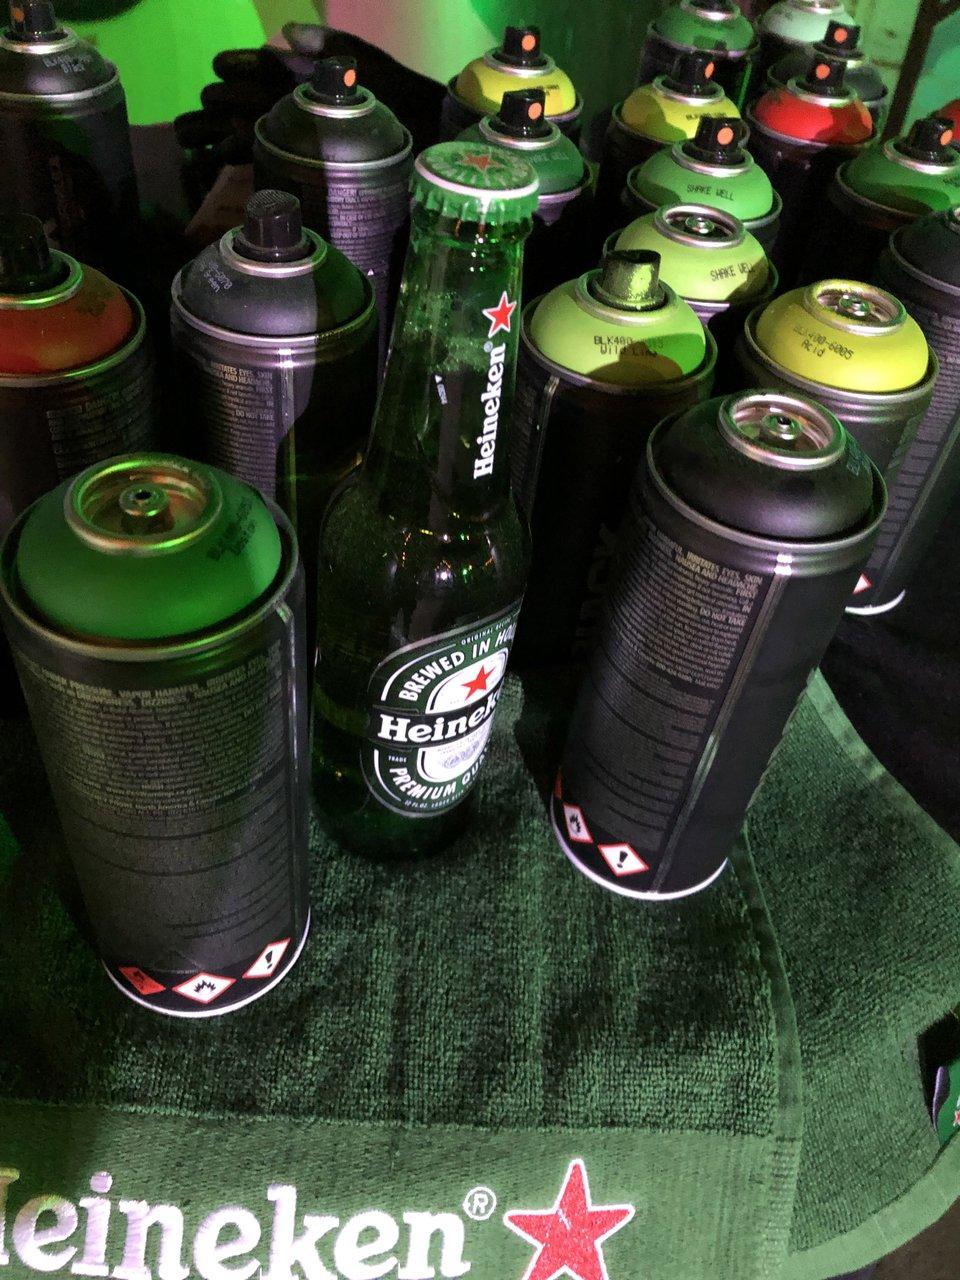 THE PARTY, by Heineken photo 1556490612810_IMG_9937.jpg